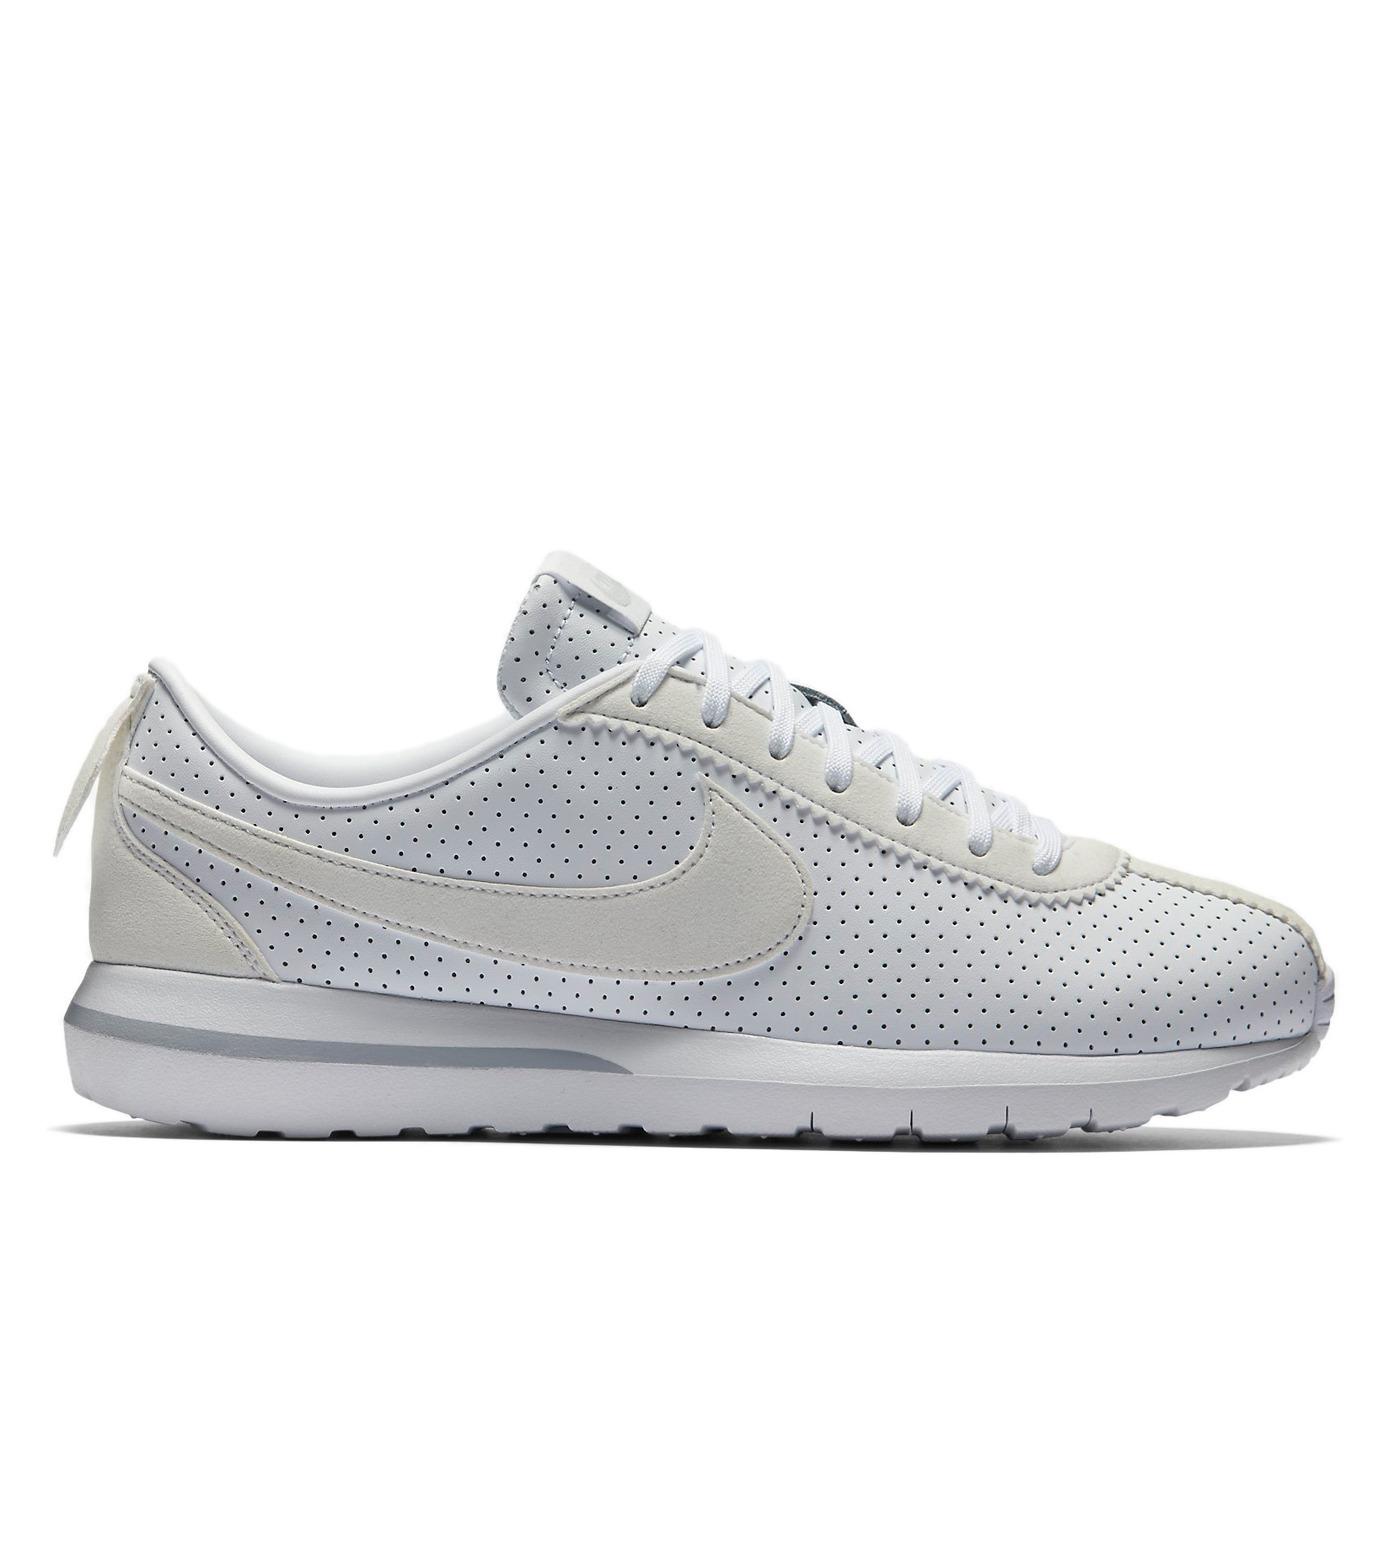 NIKE(ナイキ)のW ROSHE CORTEZ NM-WHITE(シューズ/shoes)-833804-101-4 拡大詳細画像1